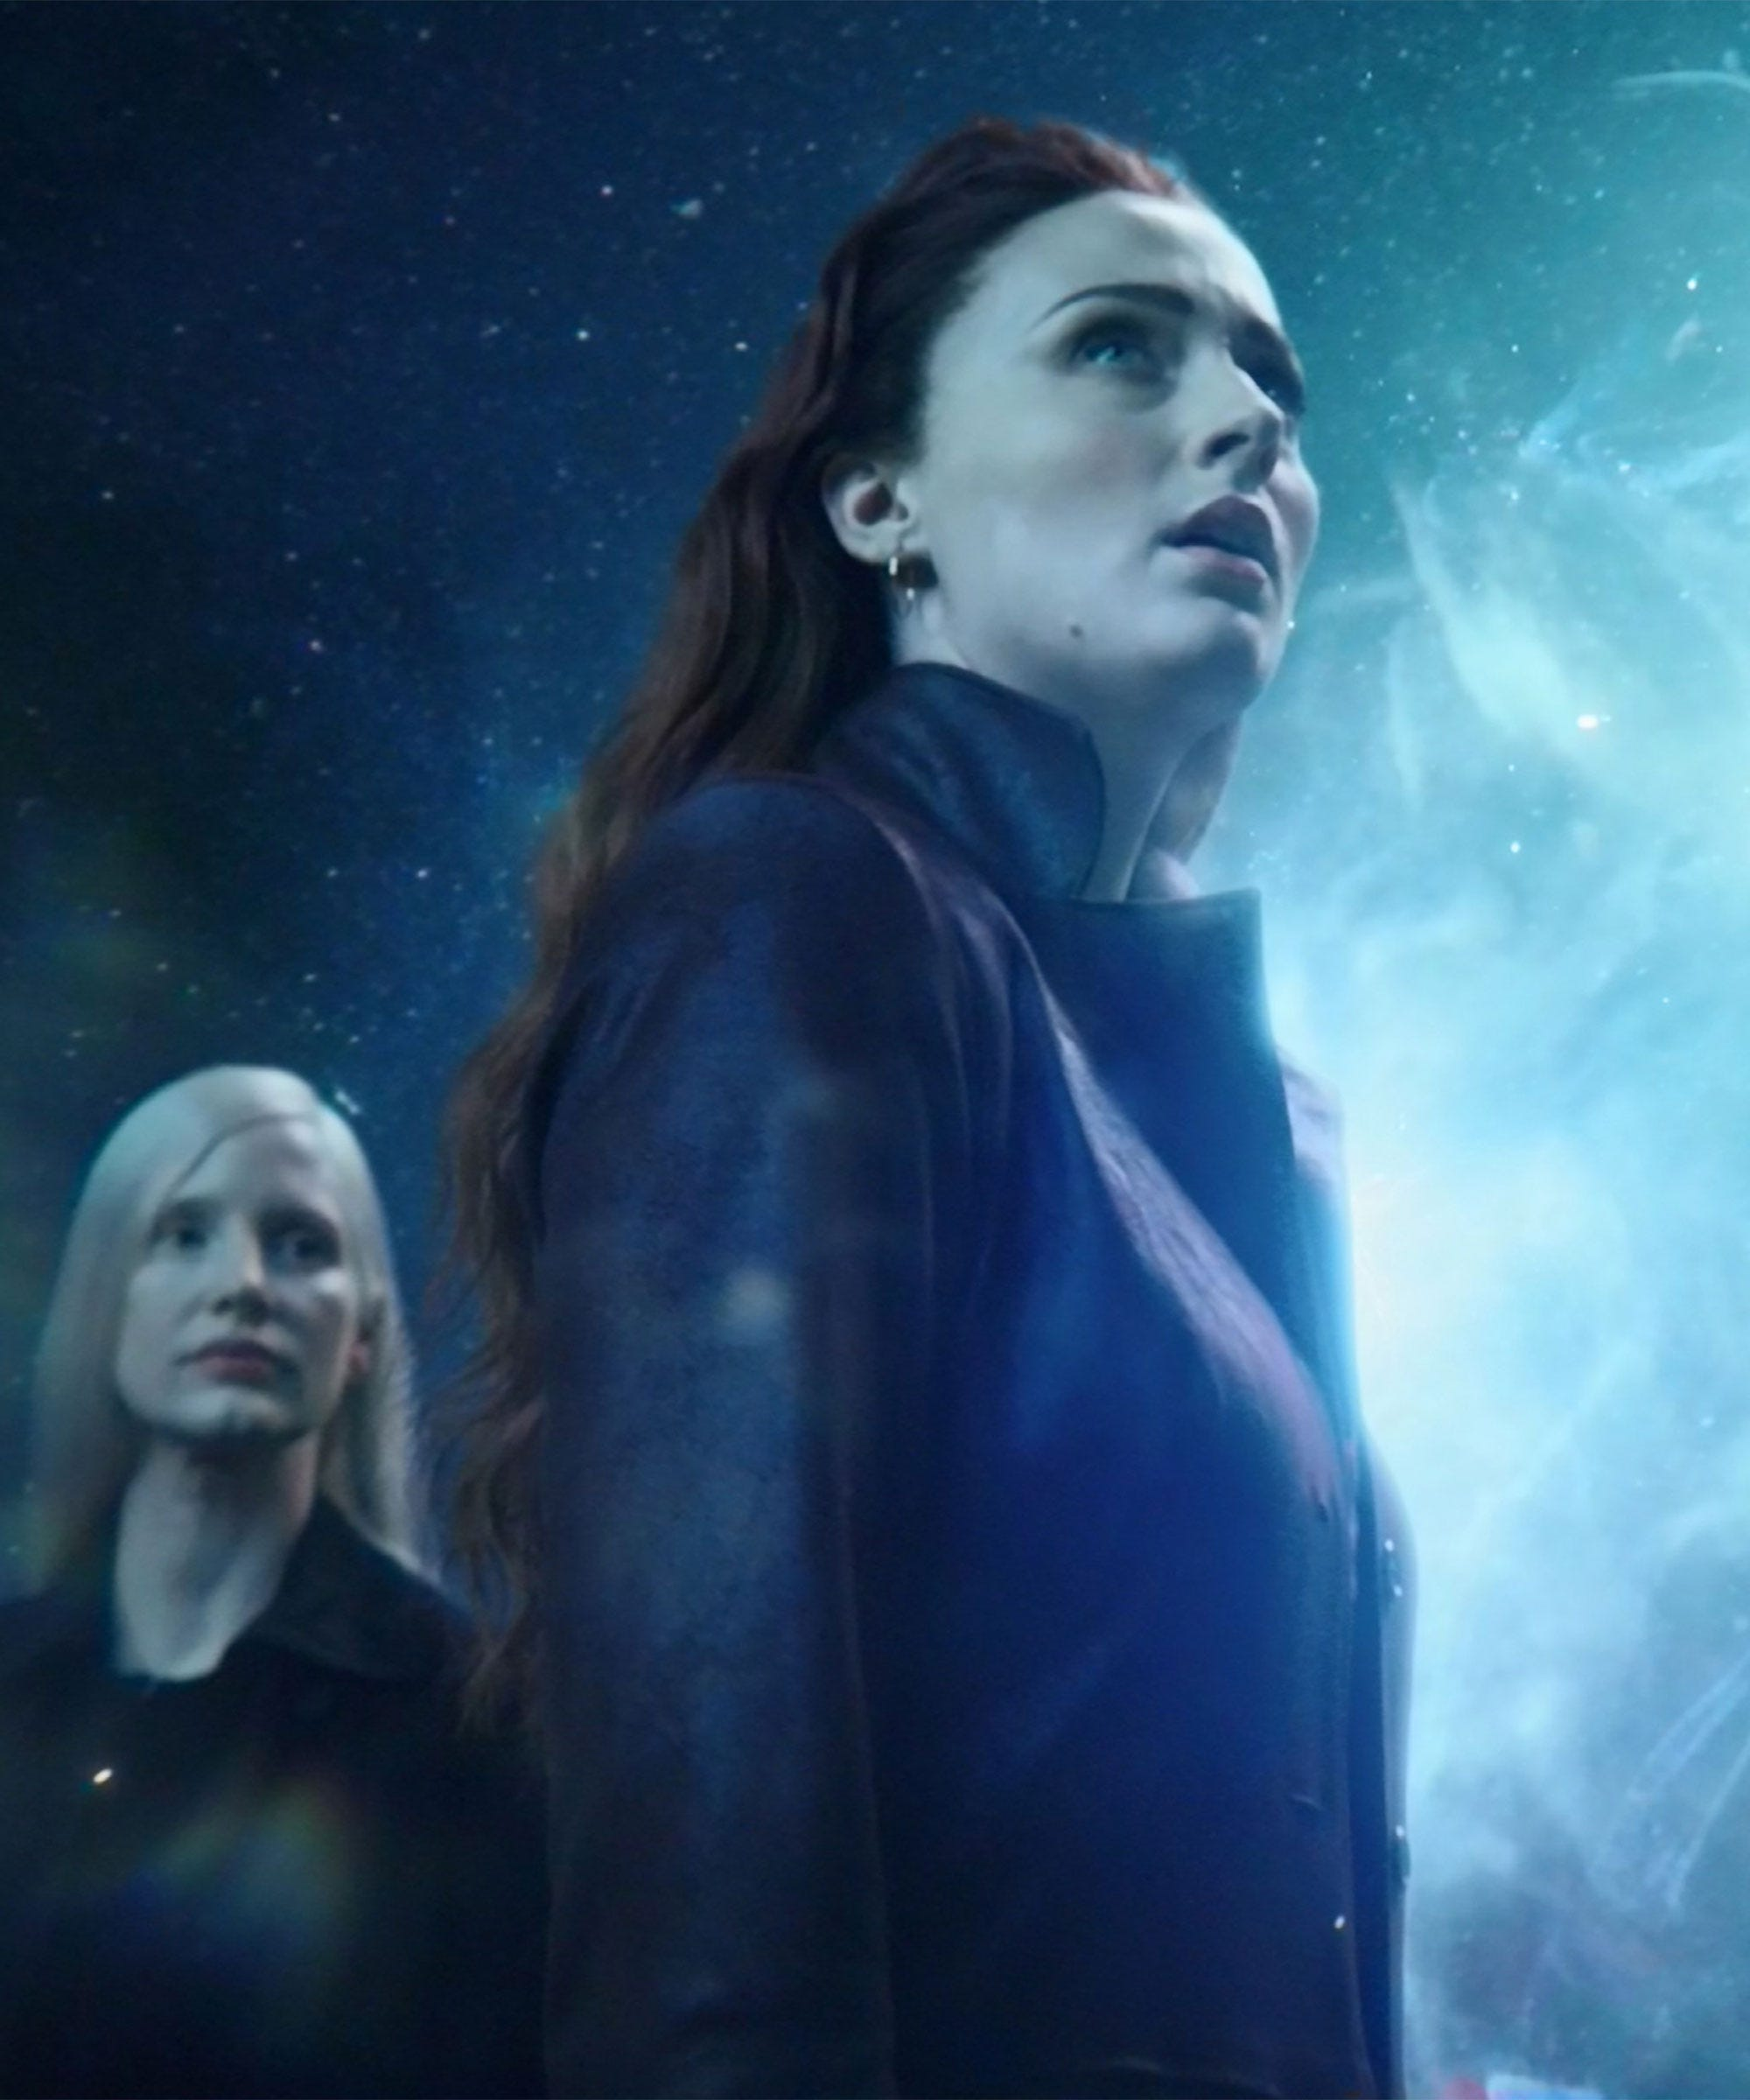 Dark Phoenix Jean Grey And X-Men Characters Power Guide